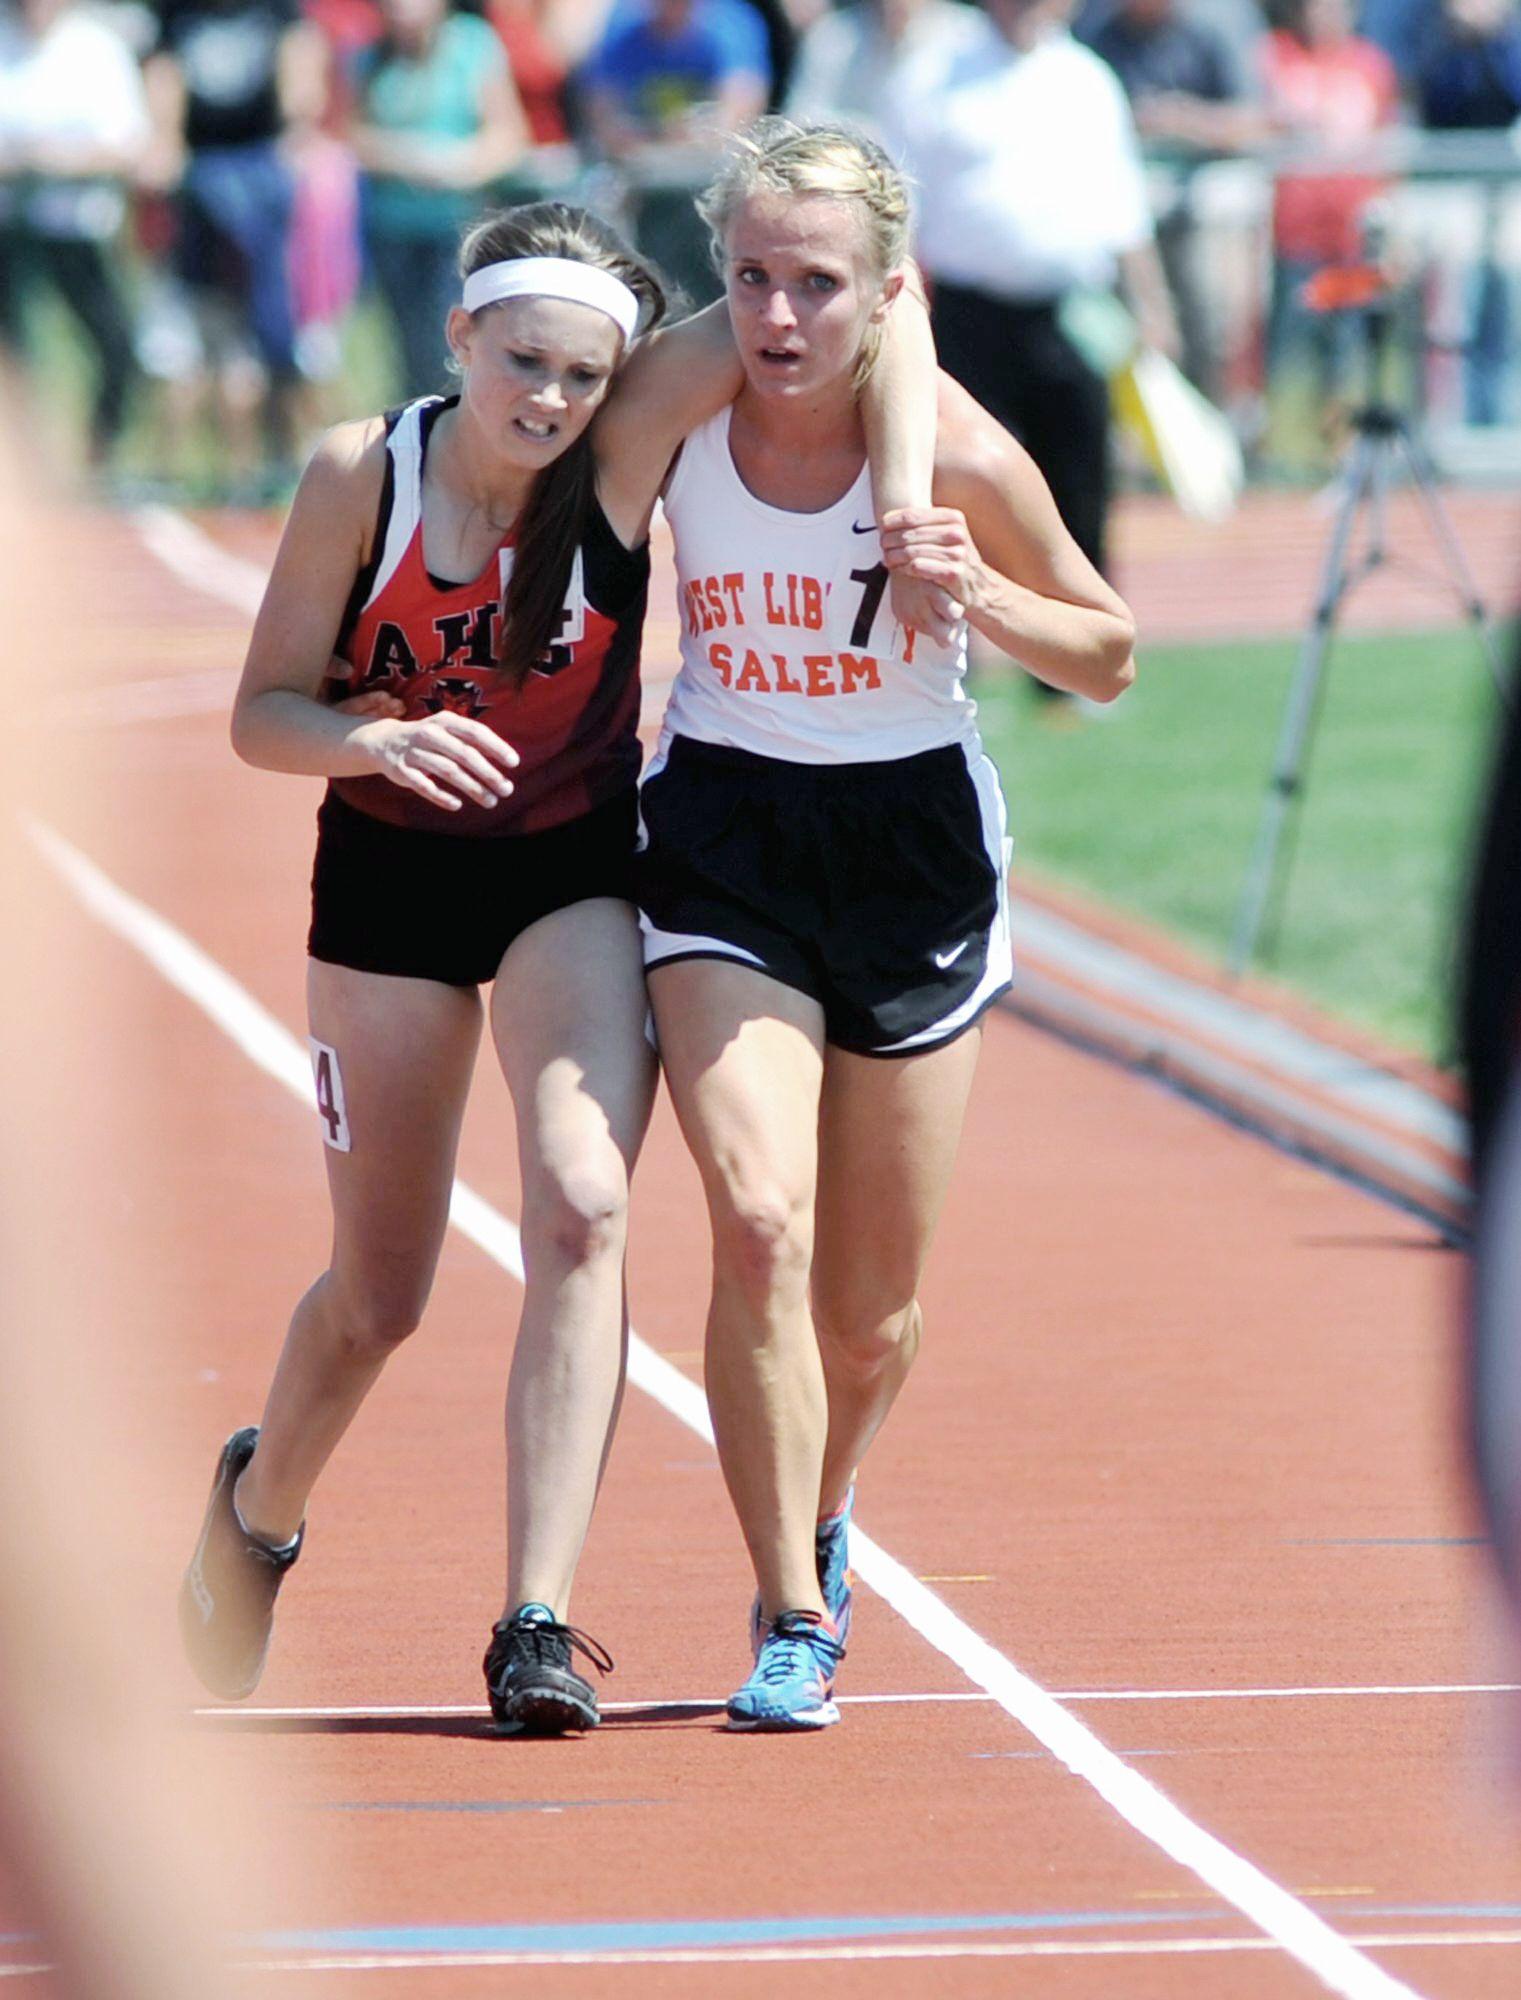 Фото между ног в спорте 16 фотография